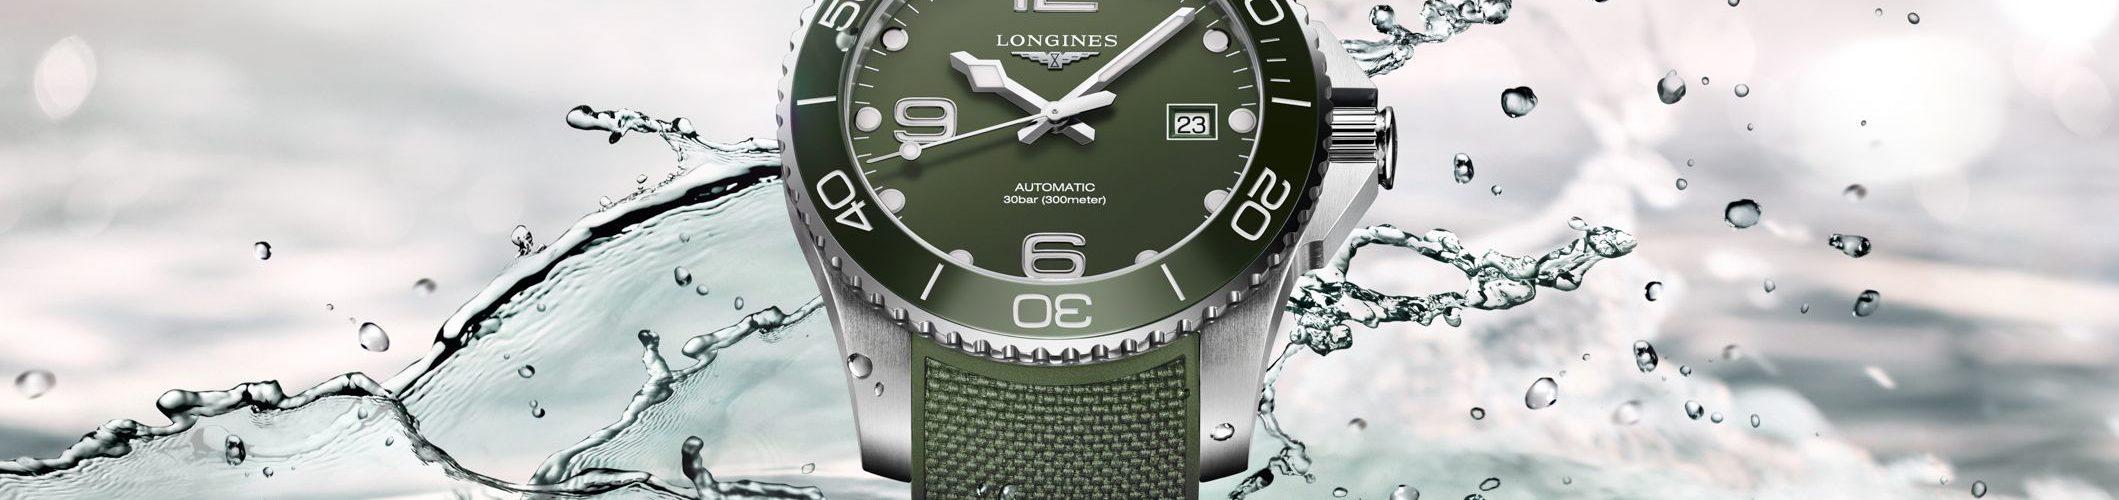 L3.781.4.06.9 Longines Hydro Conquest Grün Automatik